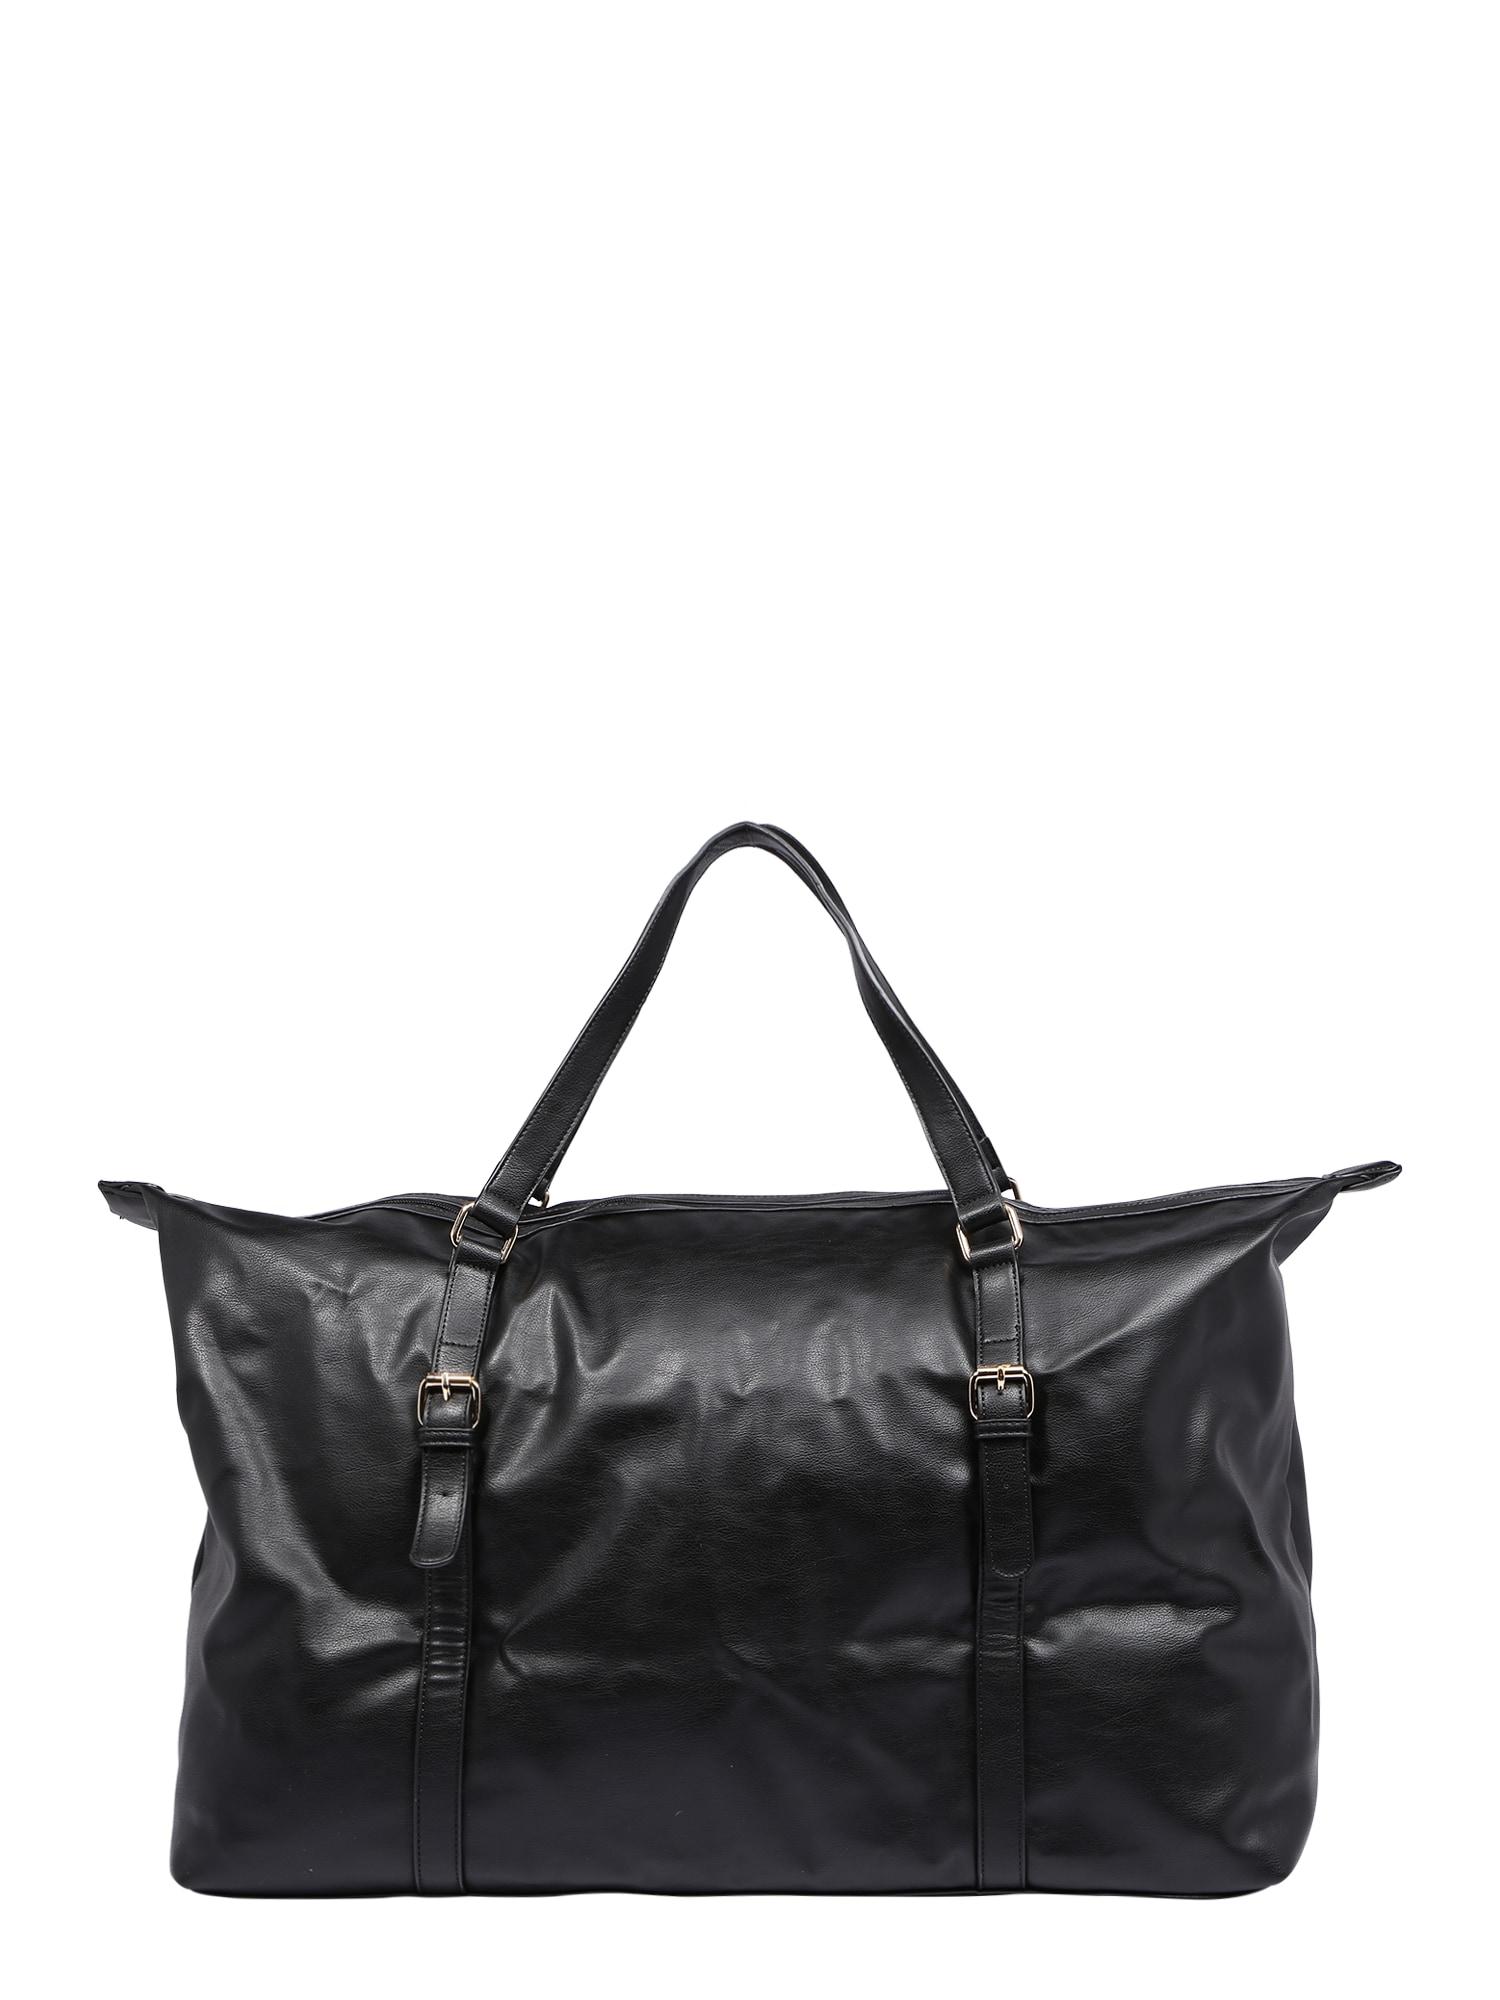 ABOUT YOU Kelioninis krepšys 'Havin' juoda